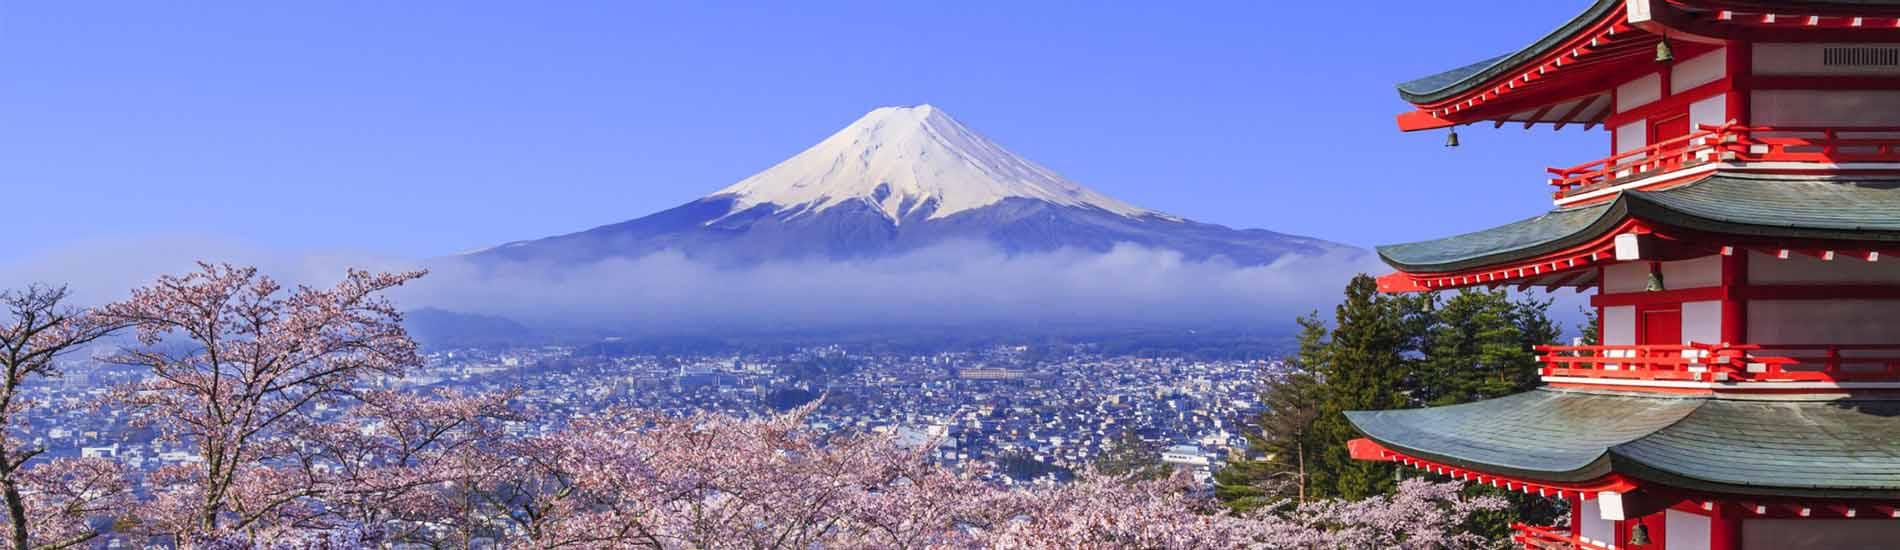 Sonsuz Keşif Japonya